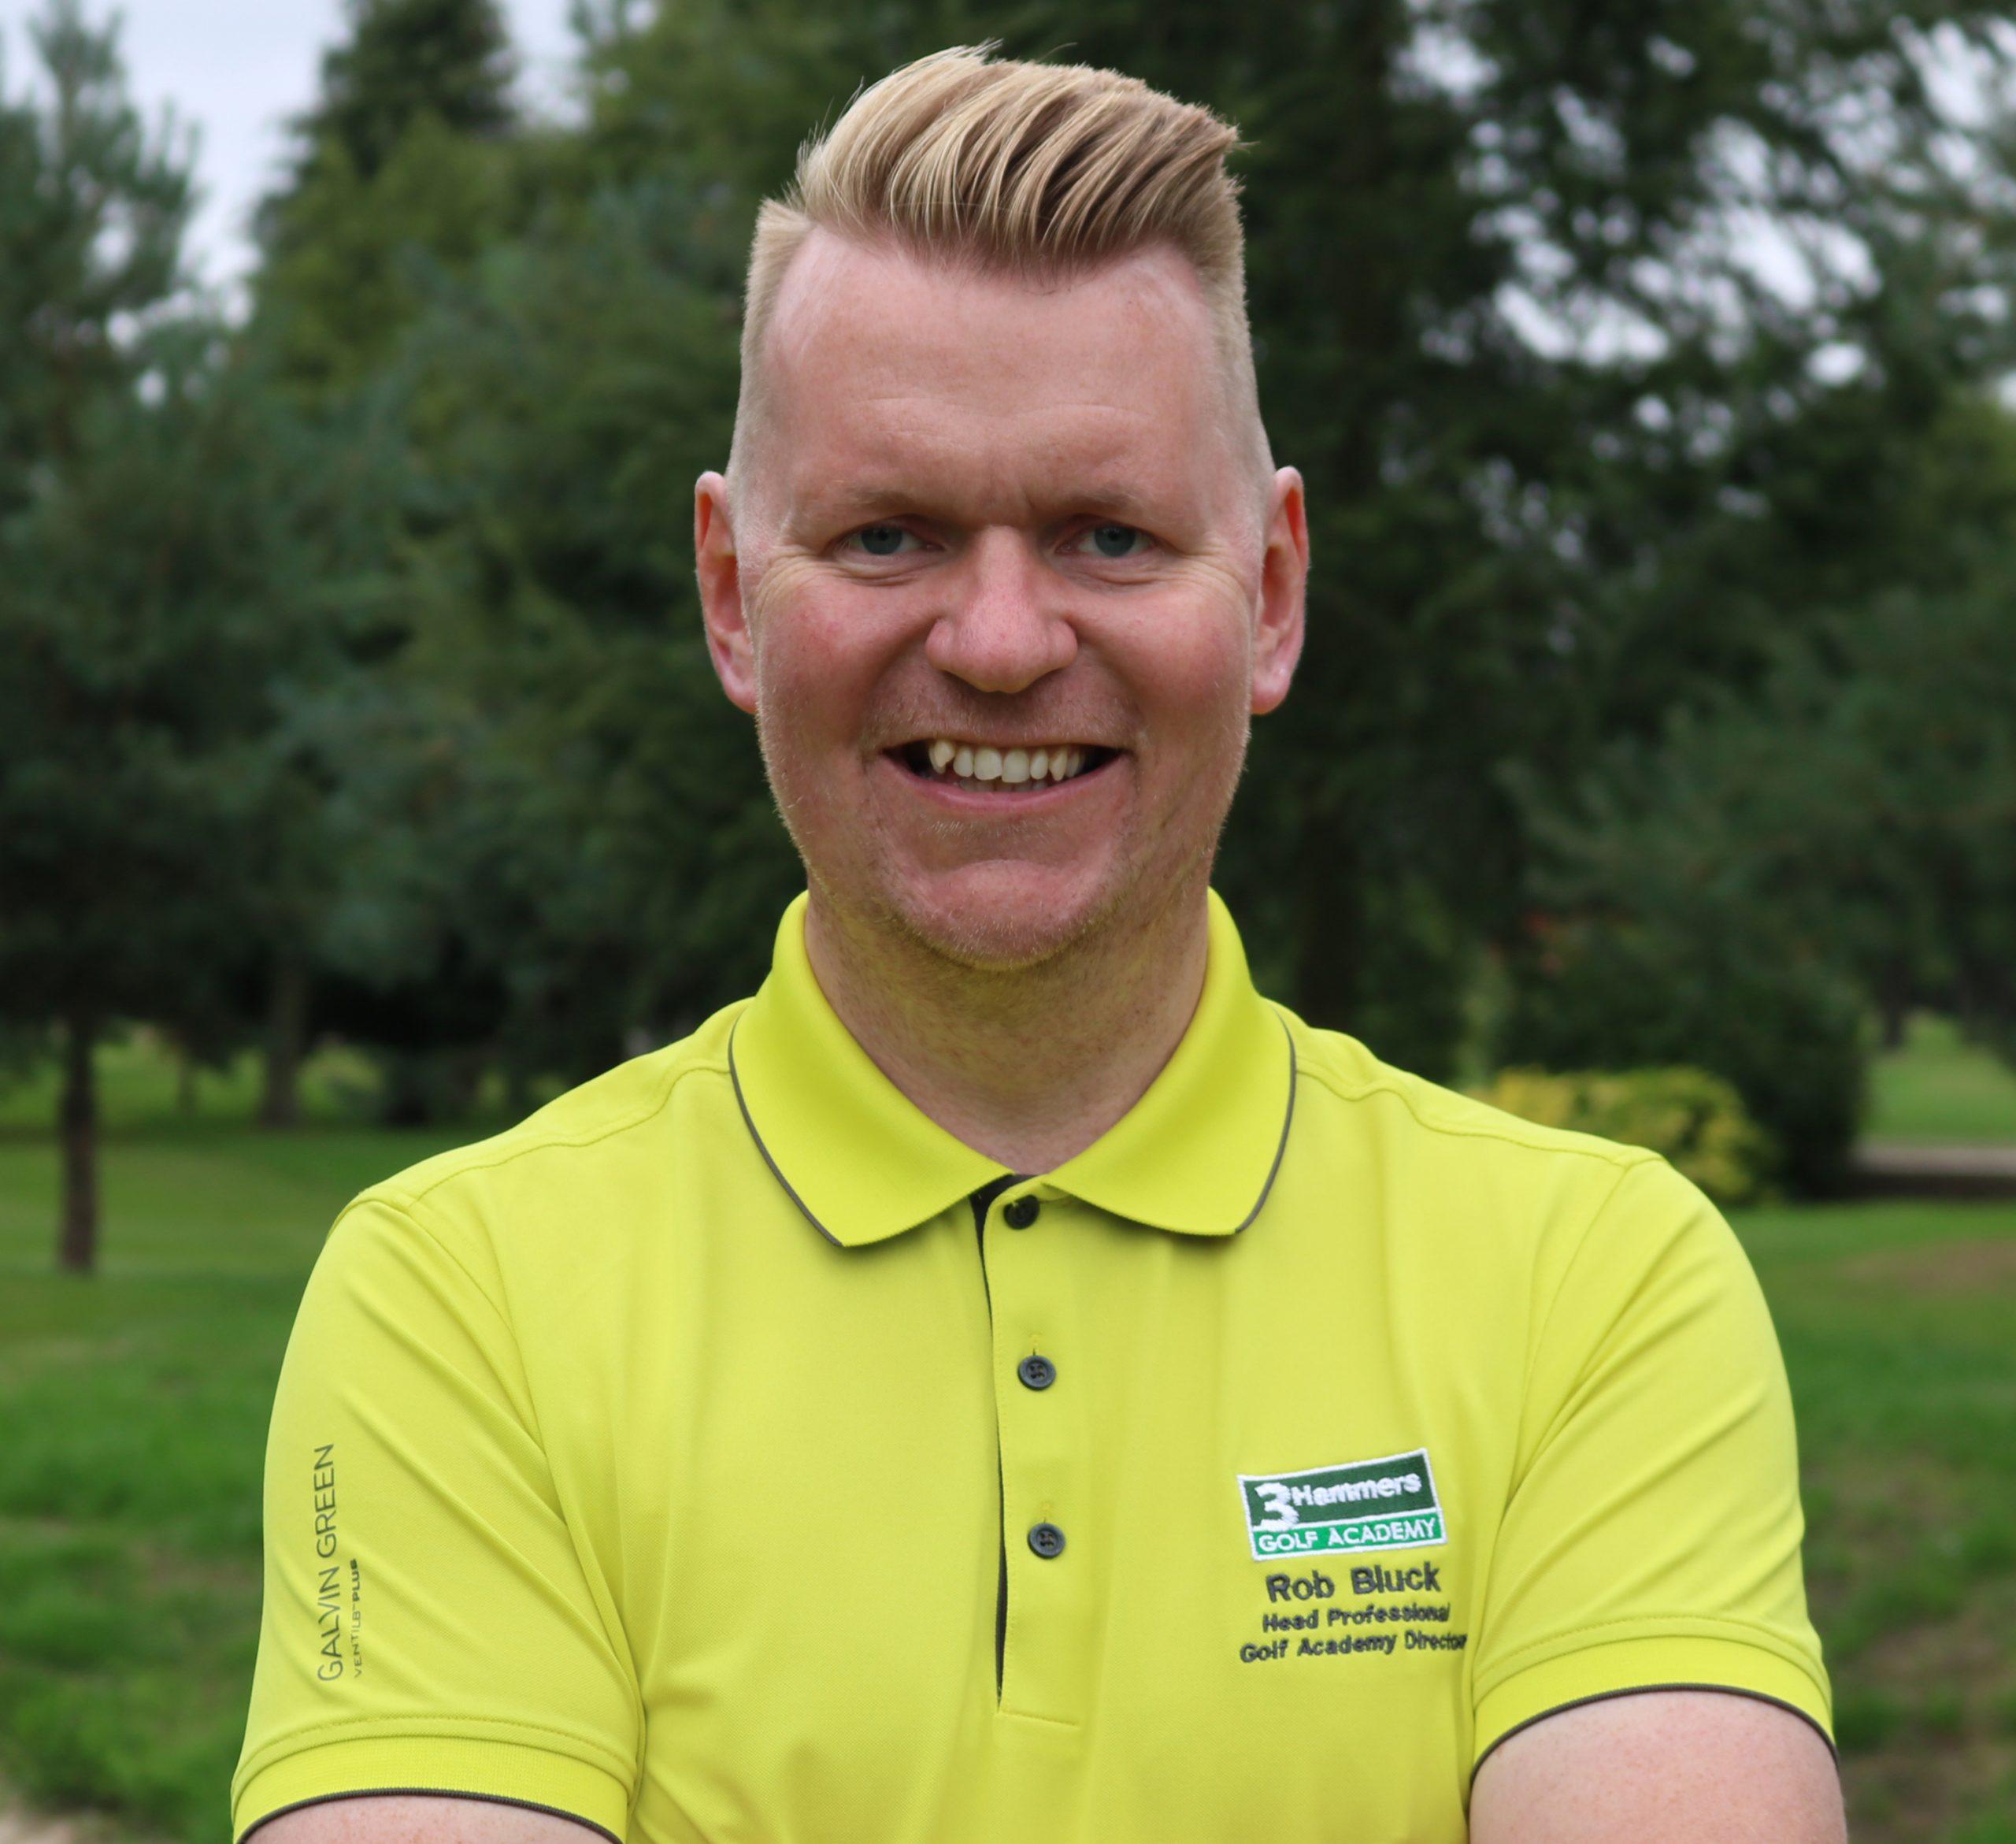 rob-bluck-3-hammers-golf-academy-director